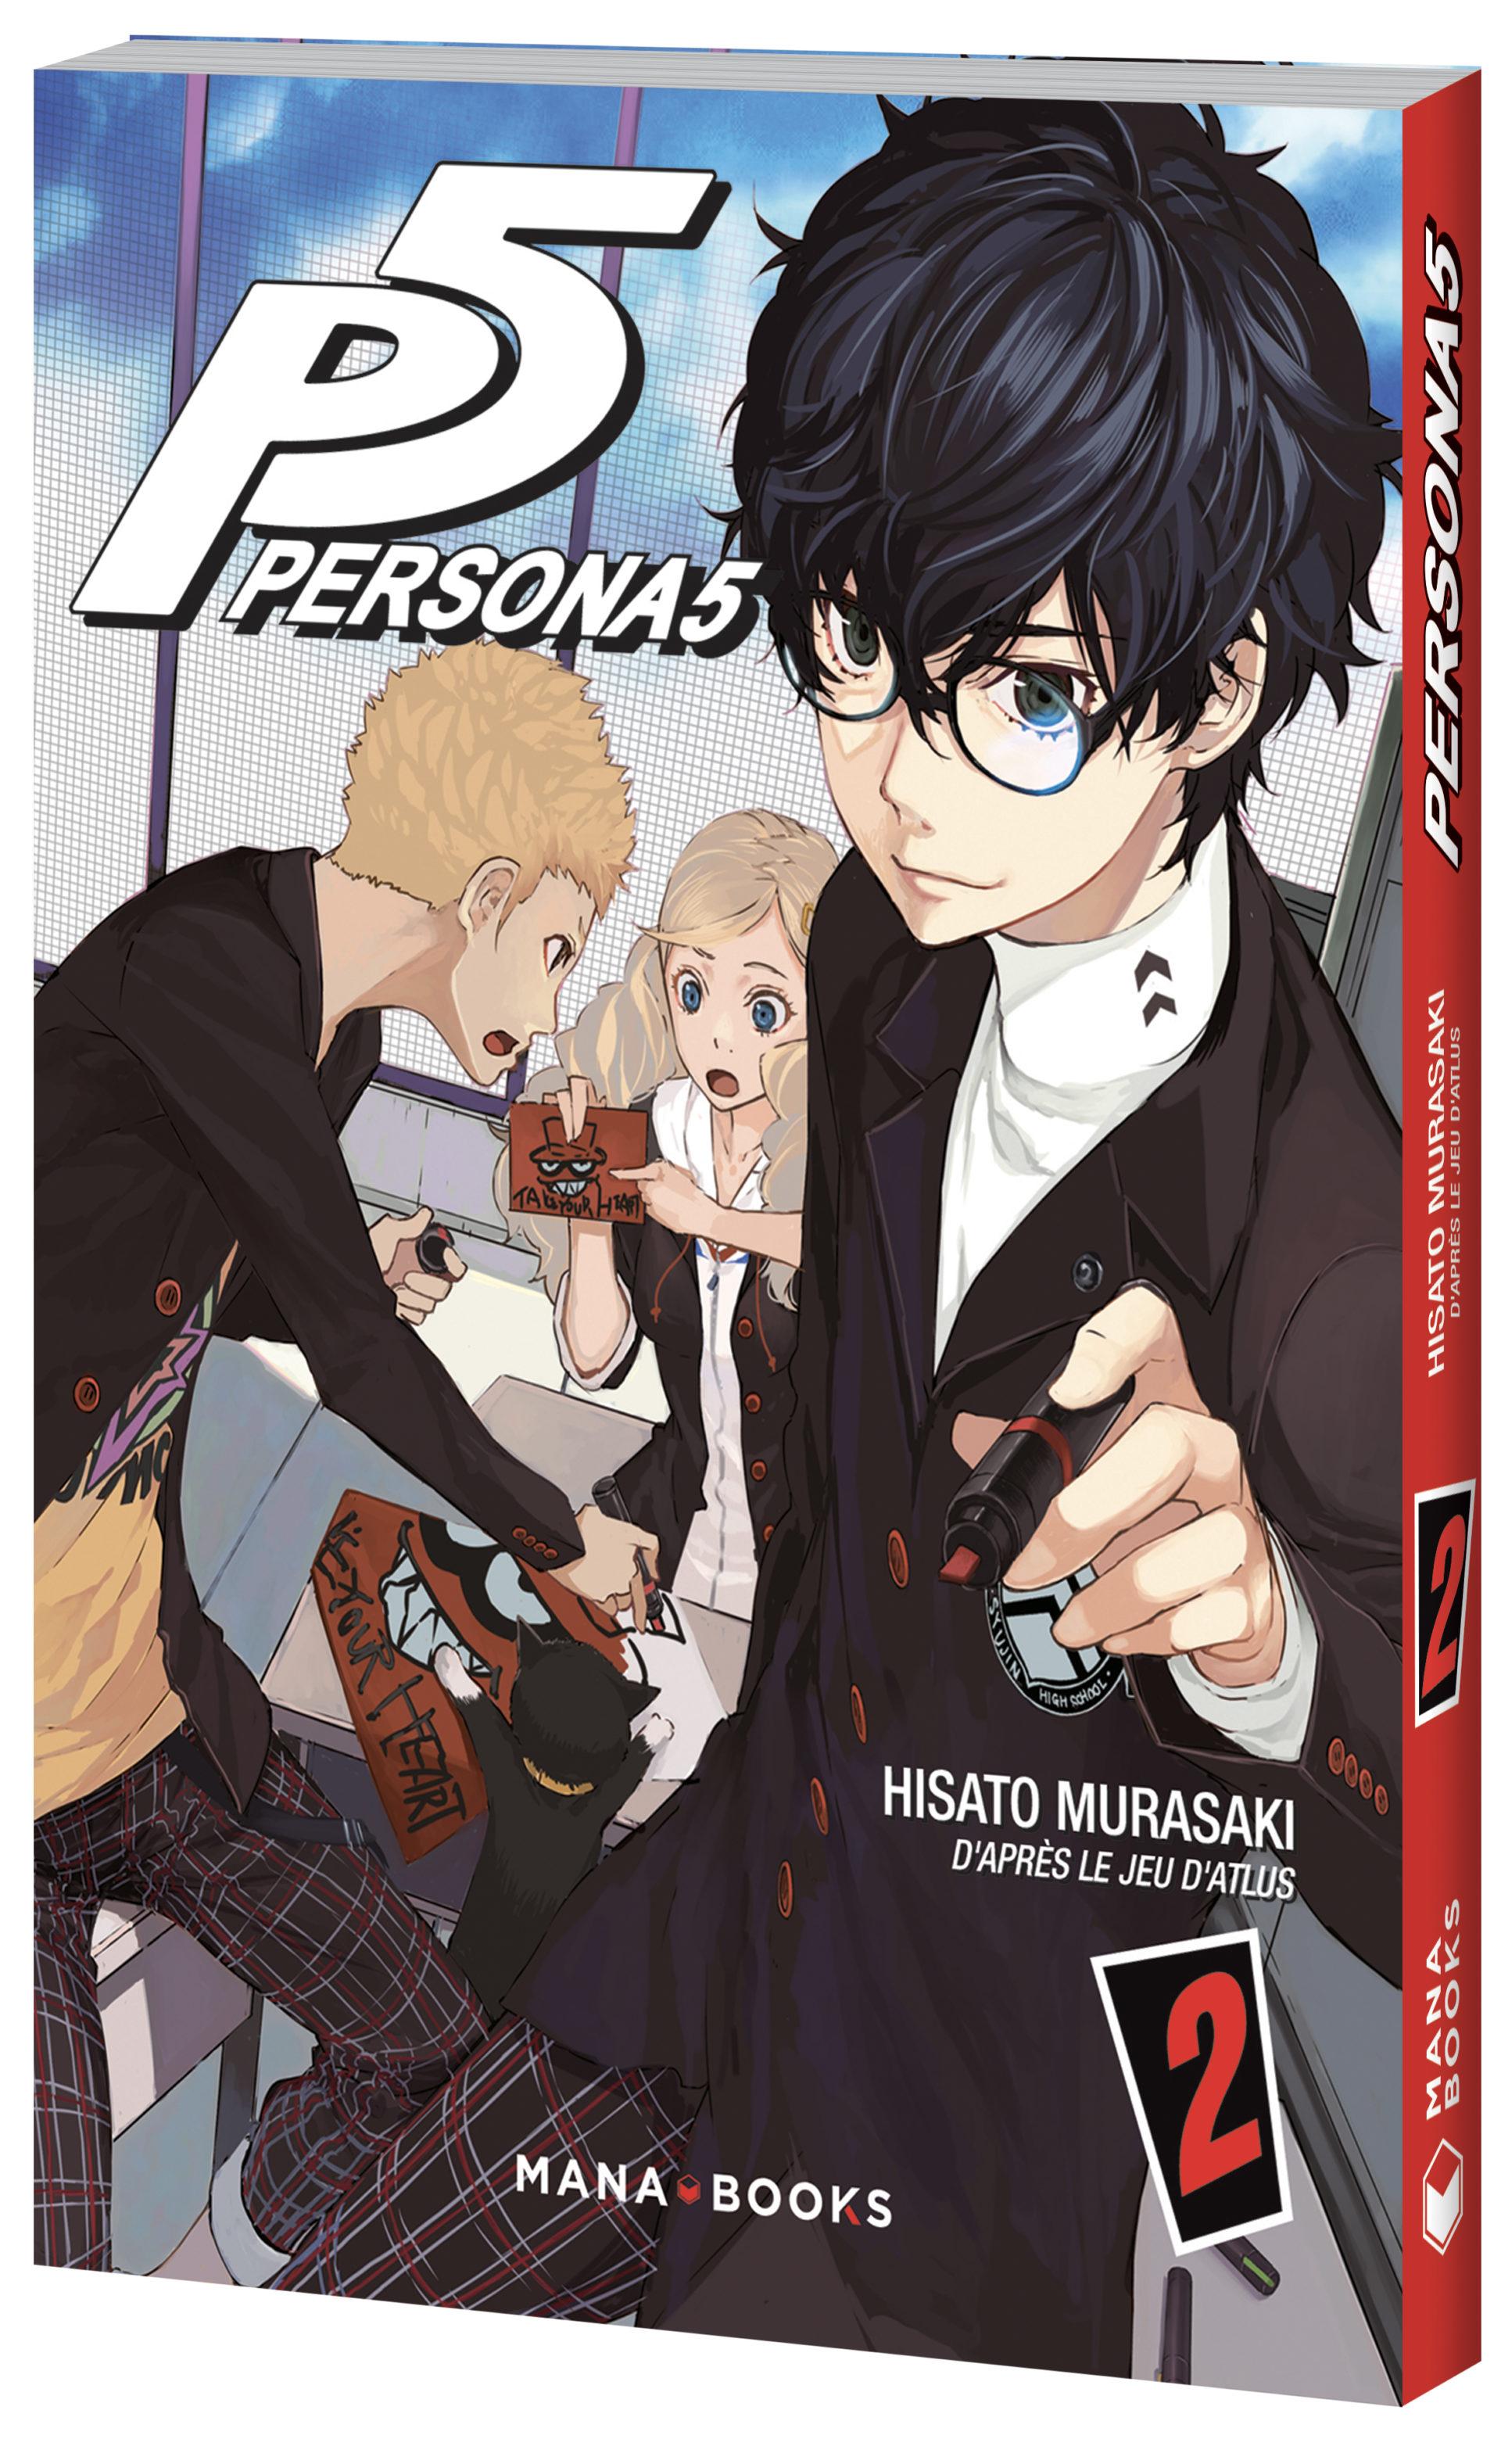 Persona 5 Tome 2 - Mana Books - Hisato Murasaki - Atlus